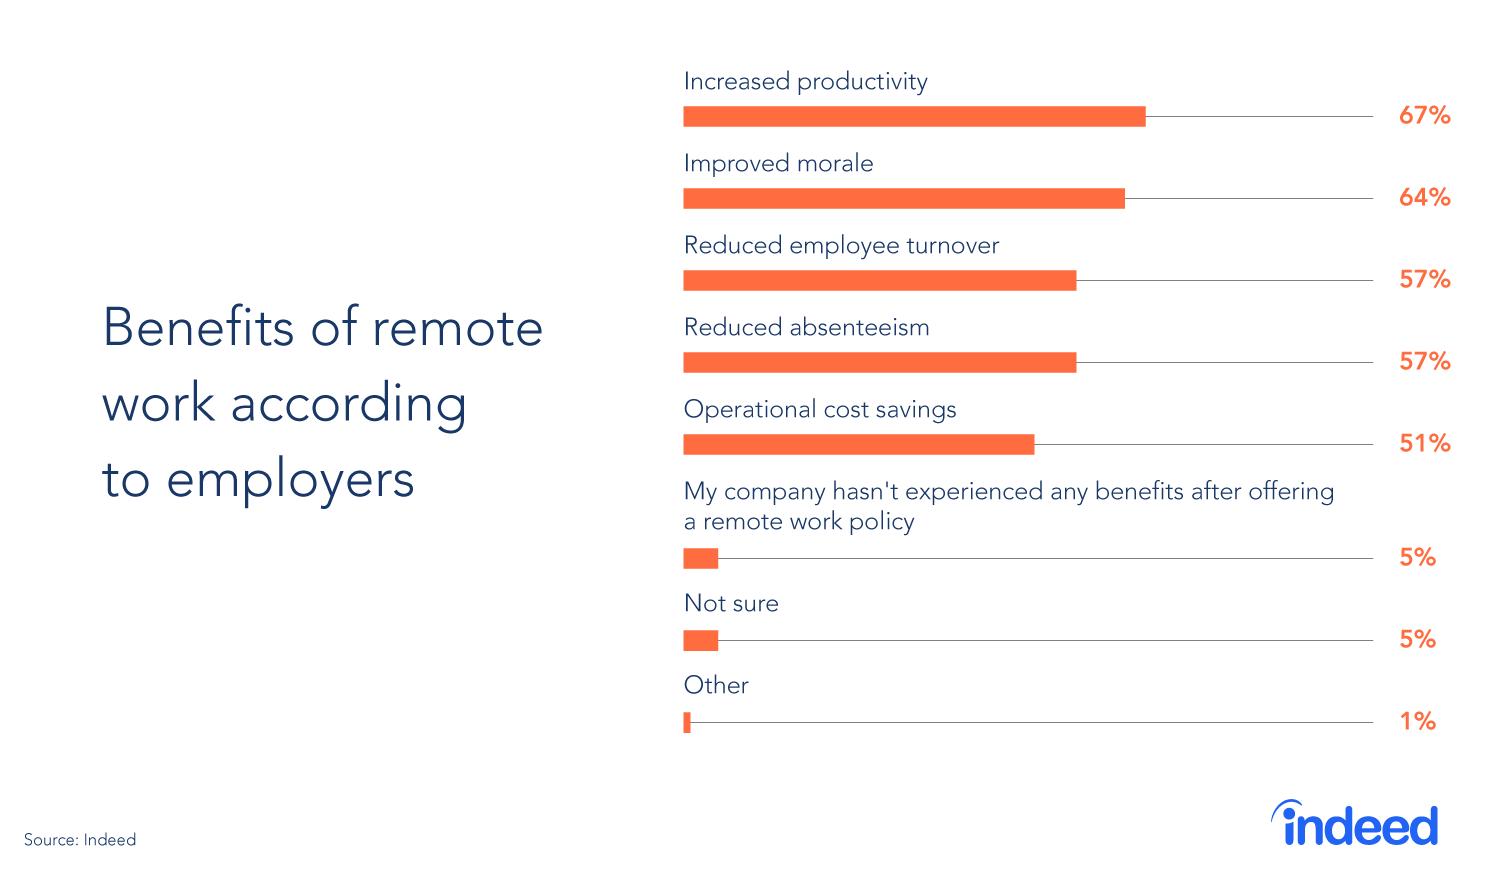 Benefits of remote work accodring to employeers